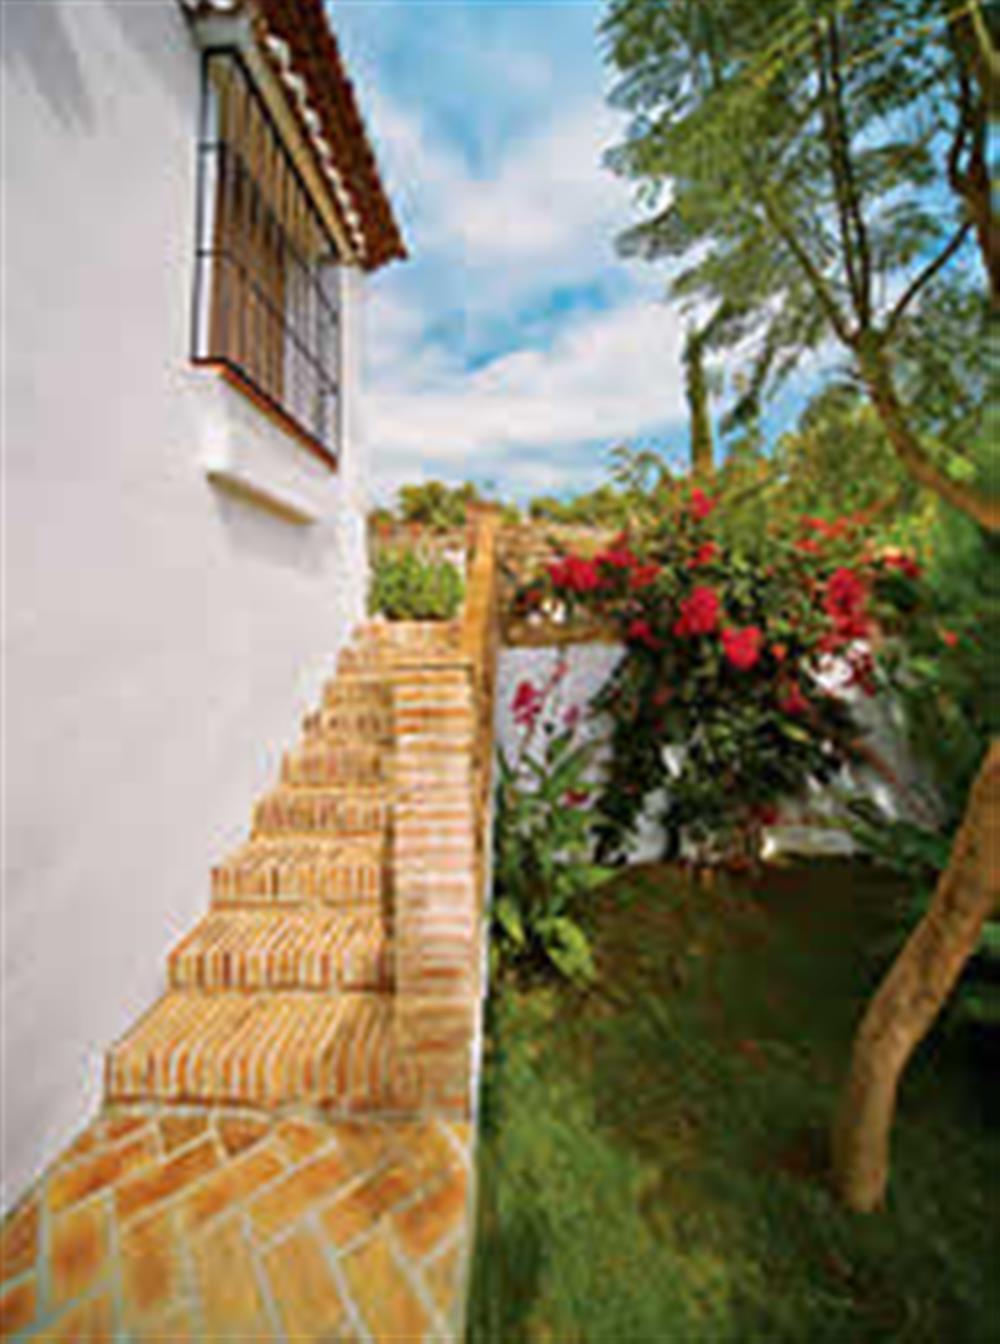 Garden at Villa Casa Jorge, Frigiliana, Andalucia, Spain